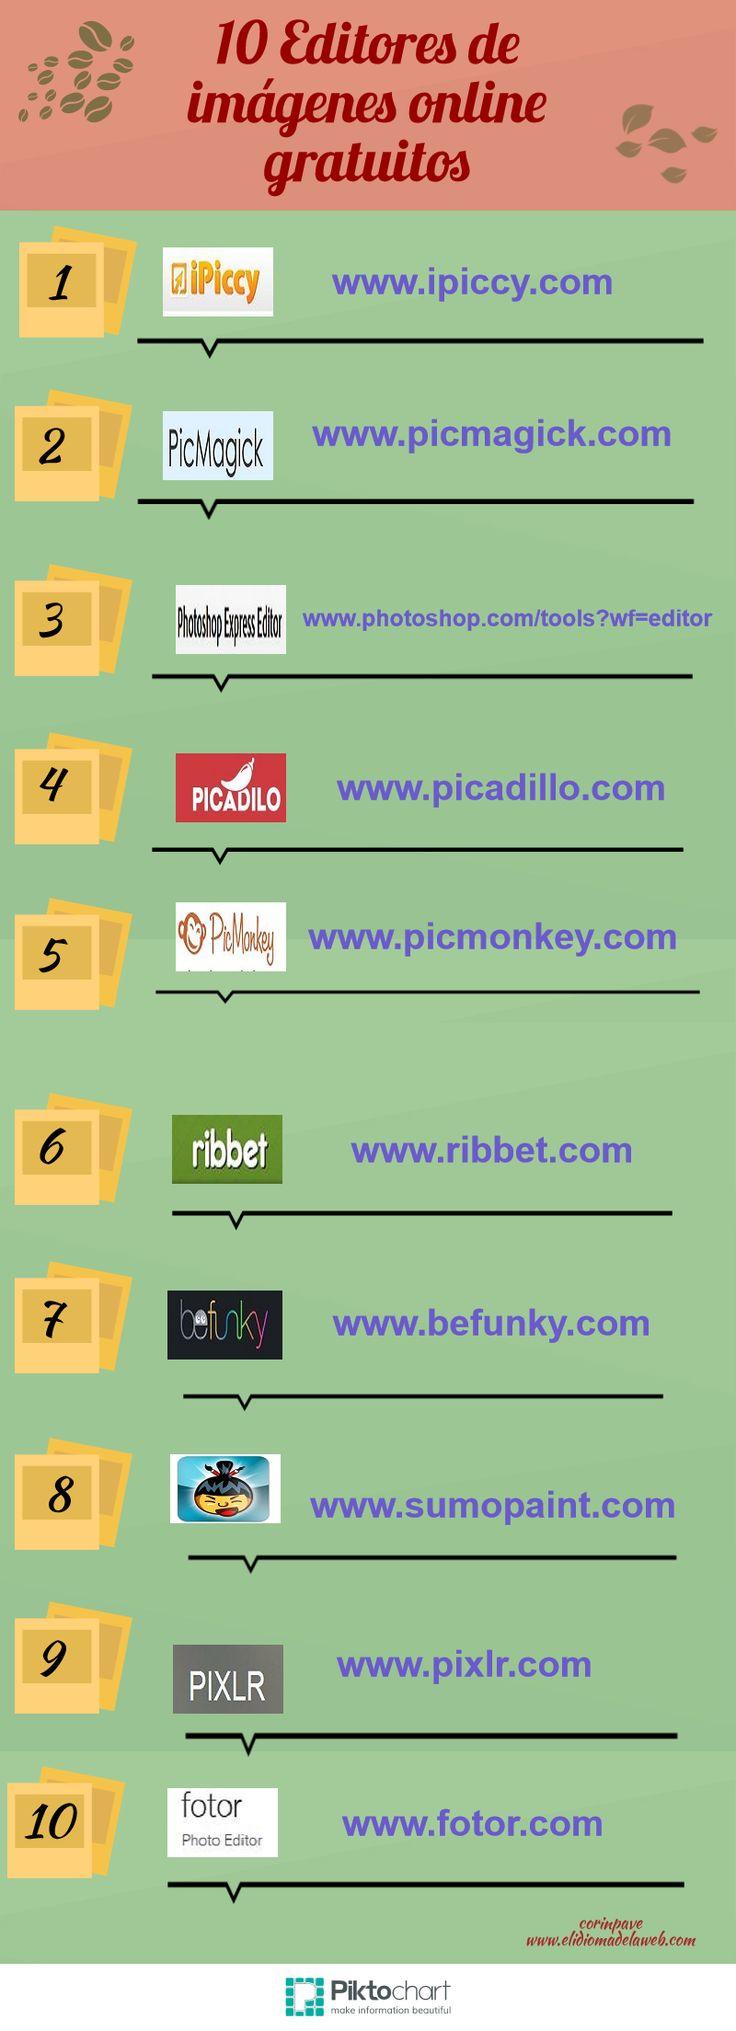 10 editores de imágenes online gratuitos #infografia #infographic vía: http://elidiomadelaweb.com/infografias/infografia-10-editores-de-imagenes-online-gratuitos/